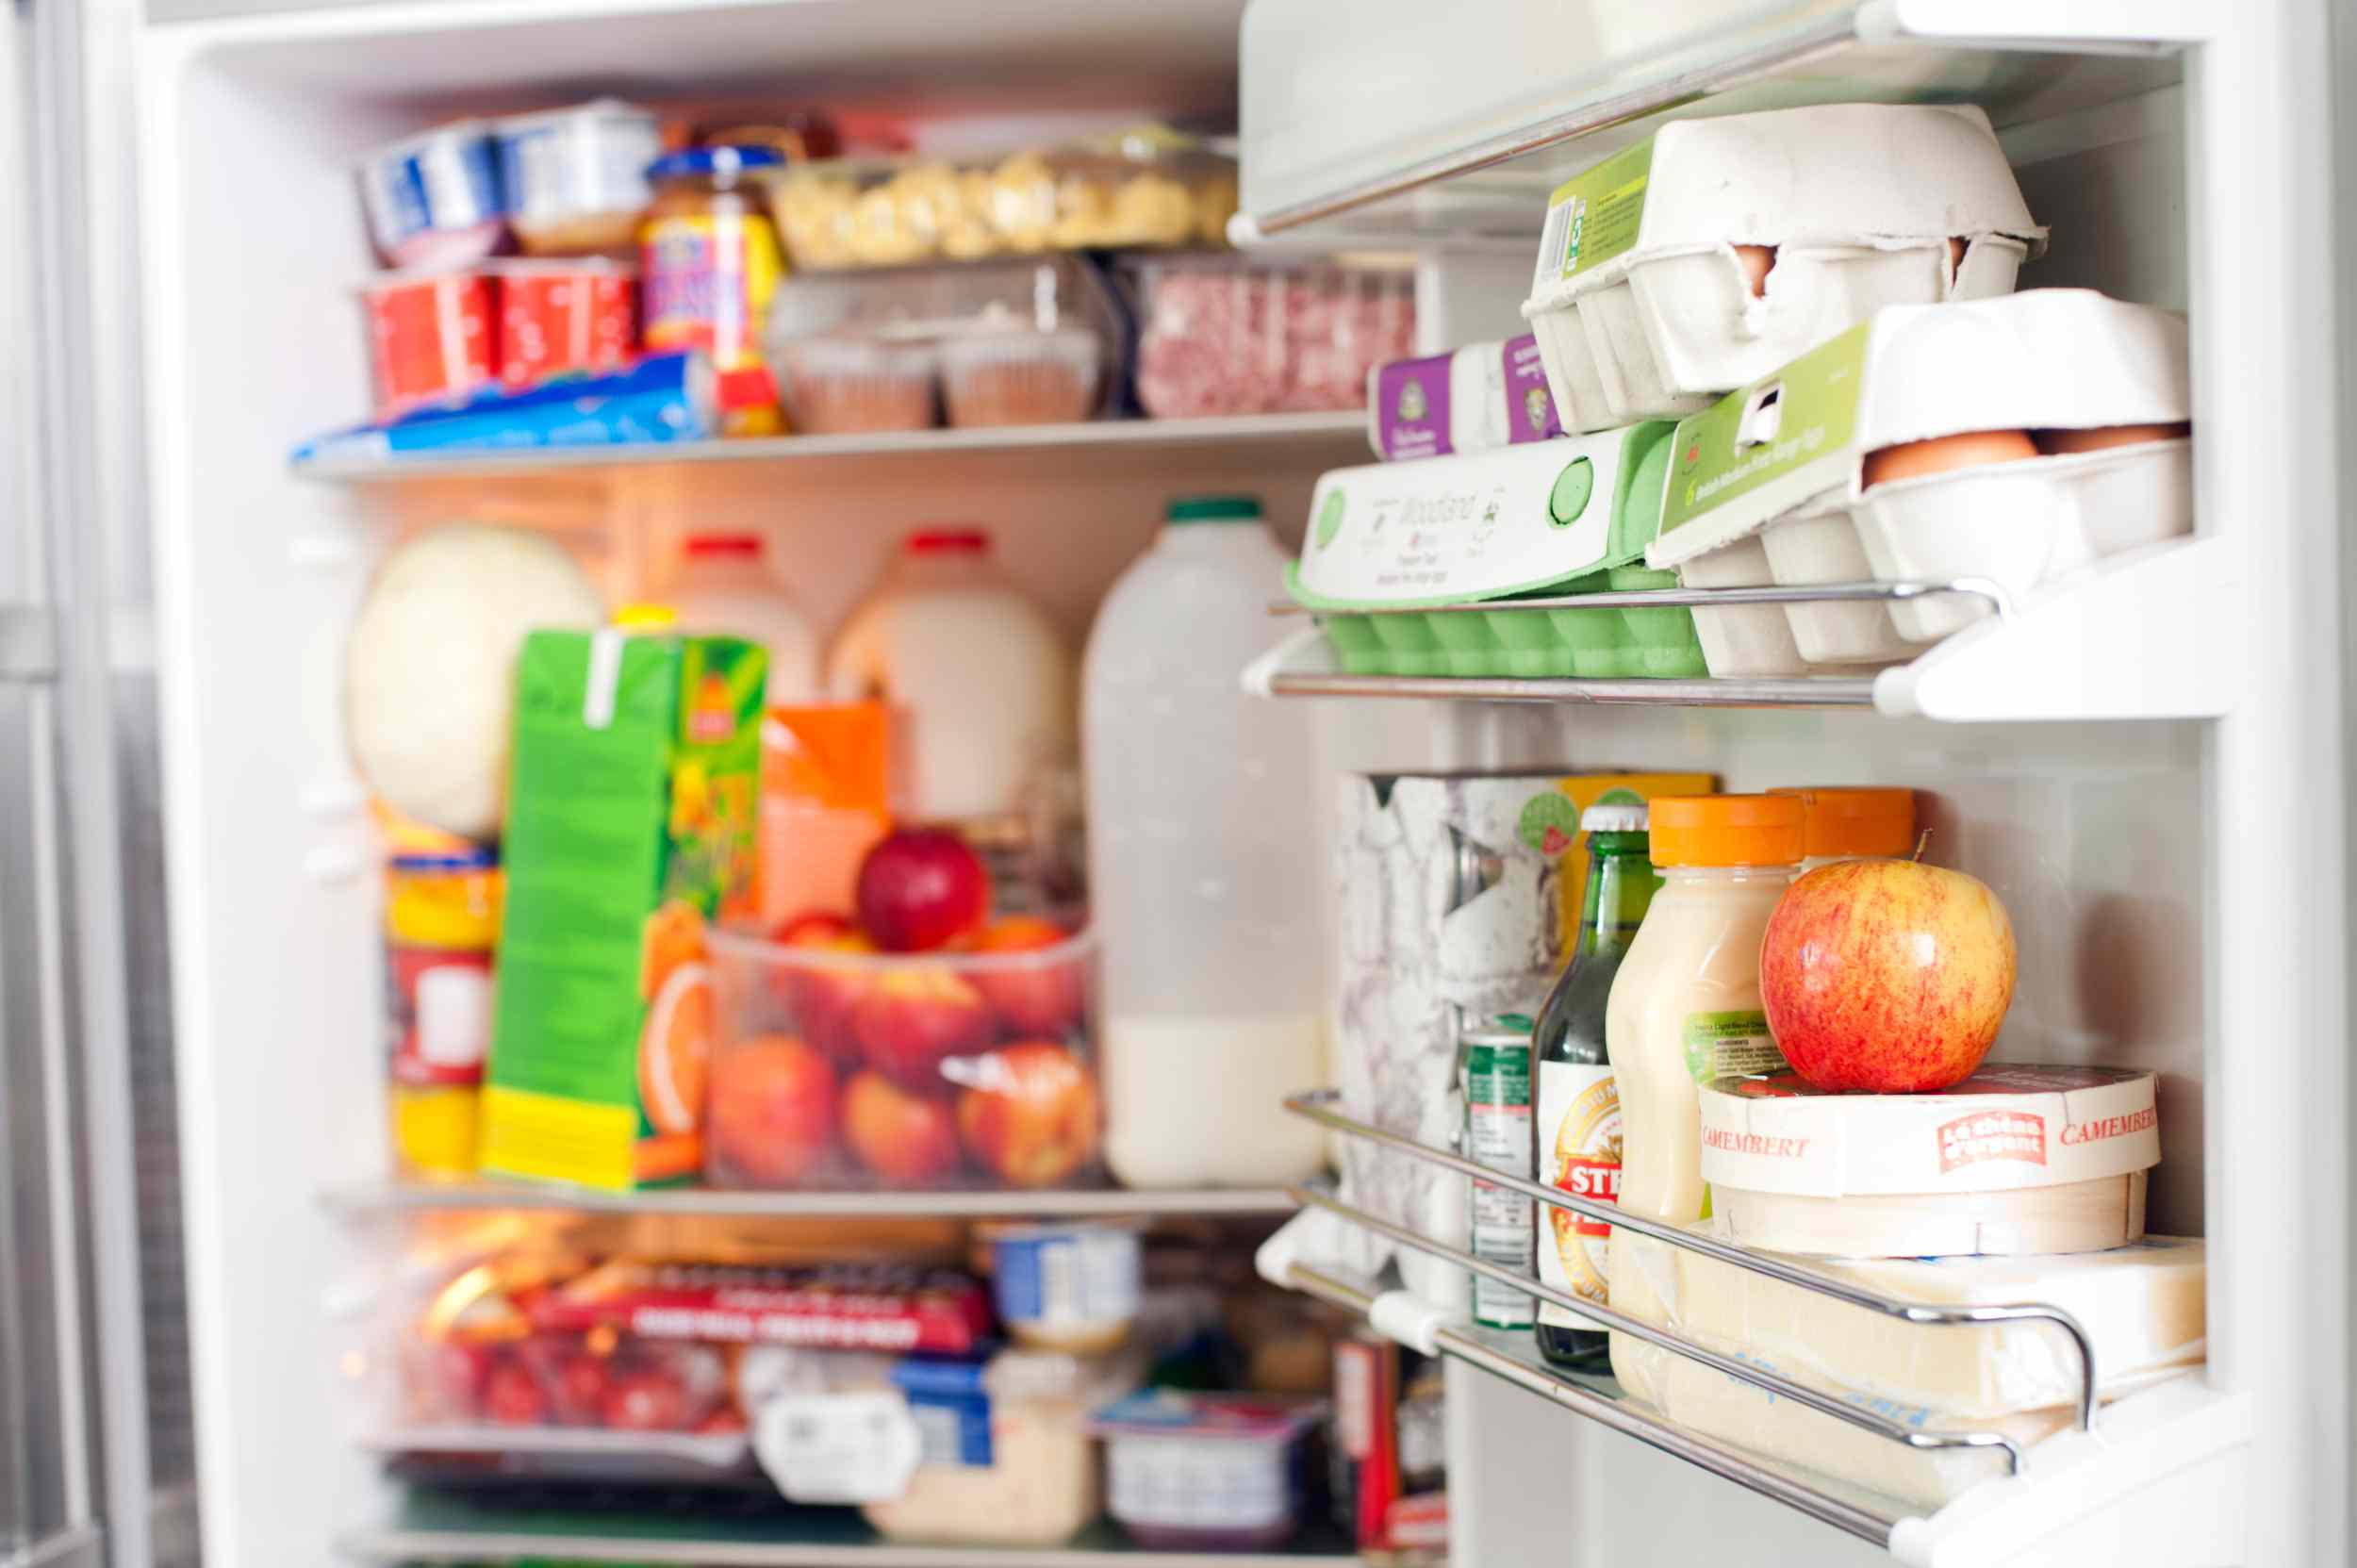 messy unorganized refrigerator